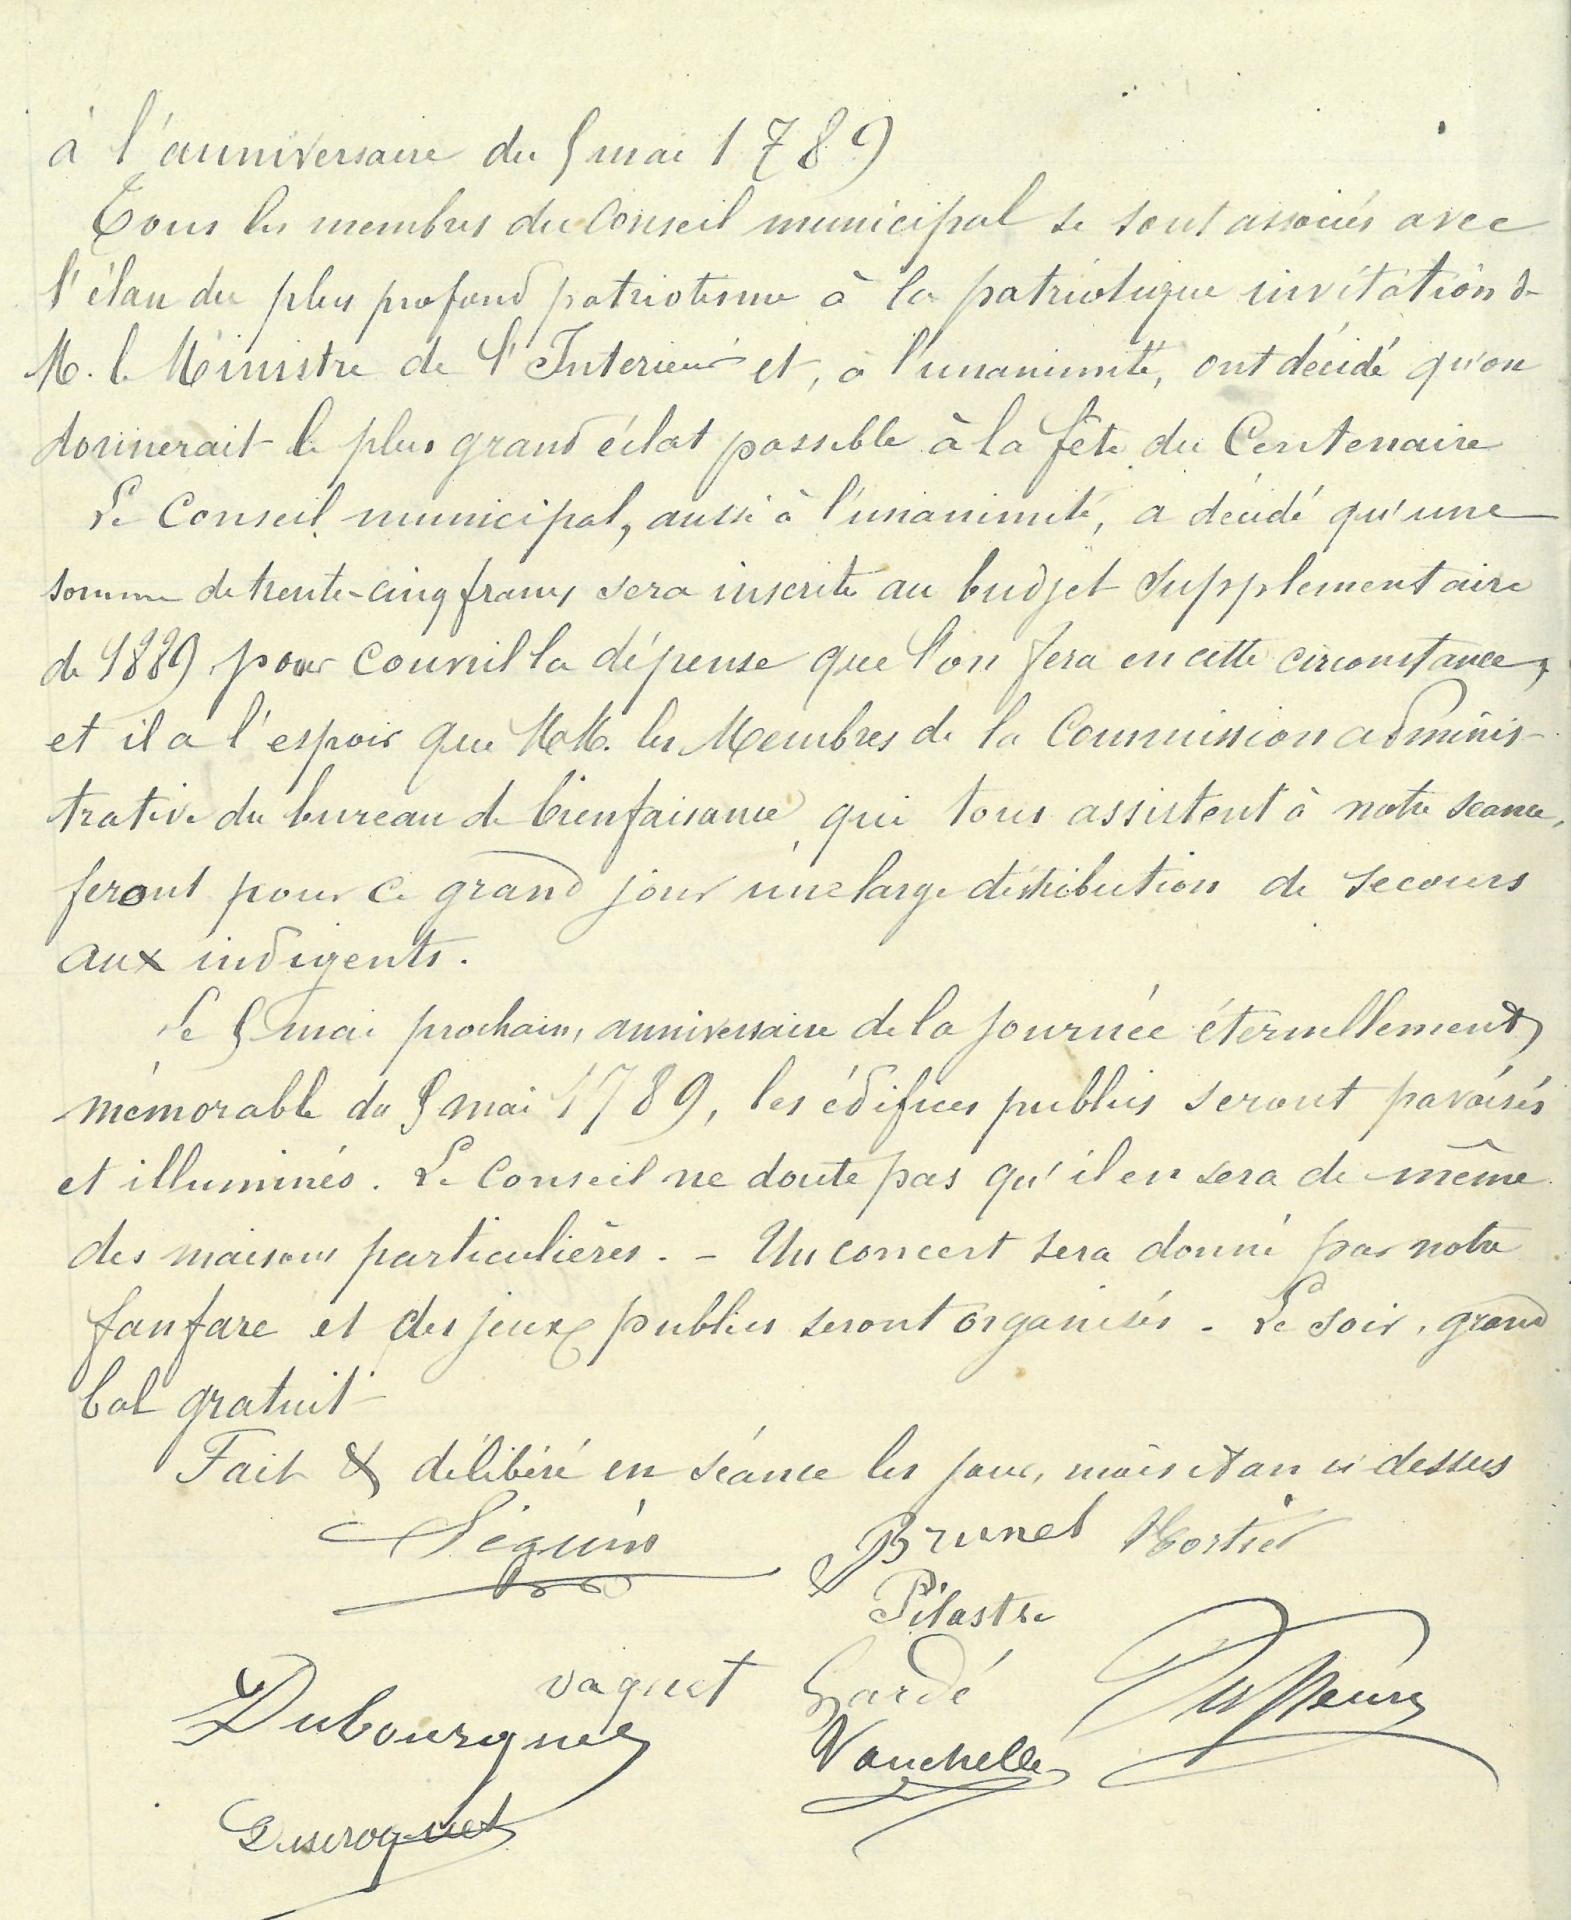 Vld dep 1d2 deliberation 188905 2